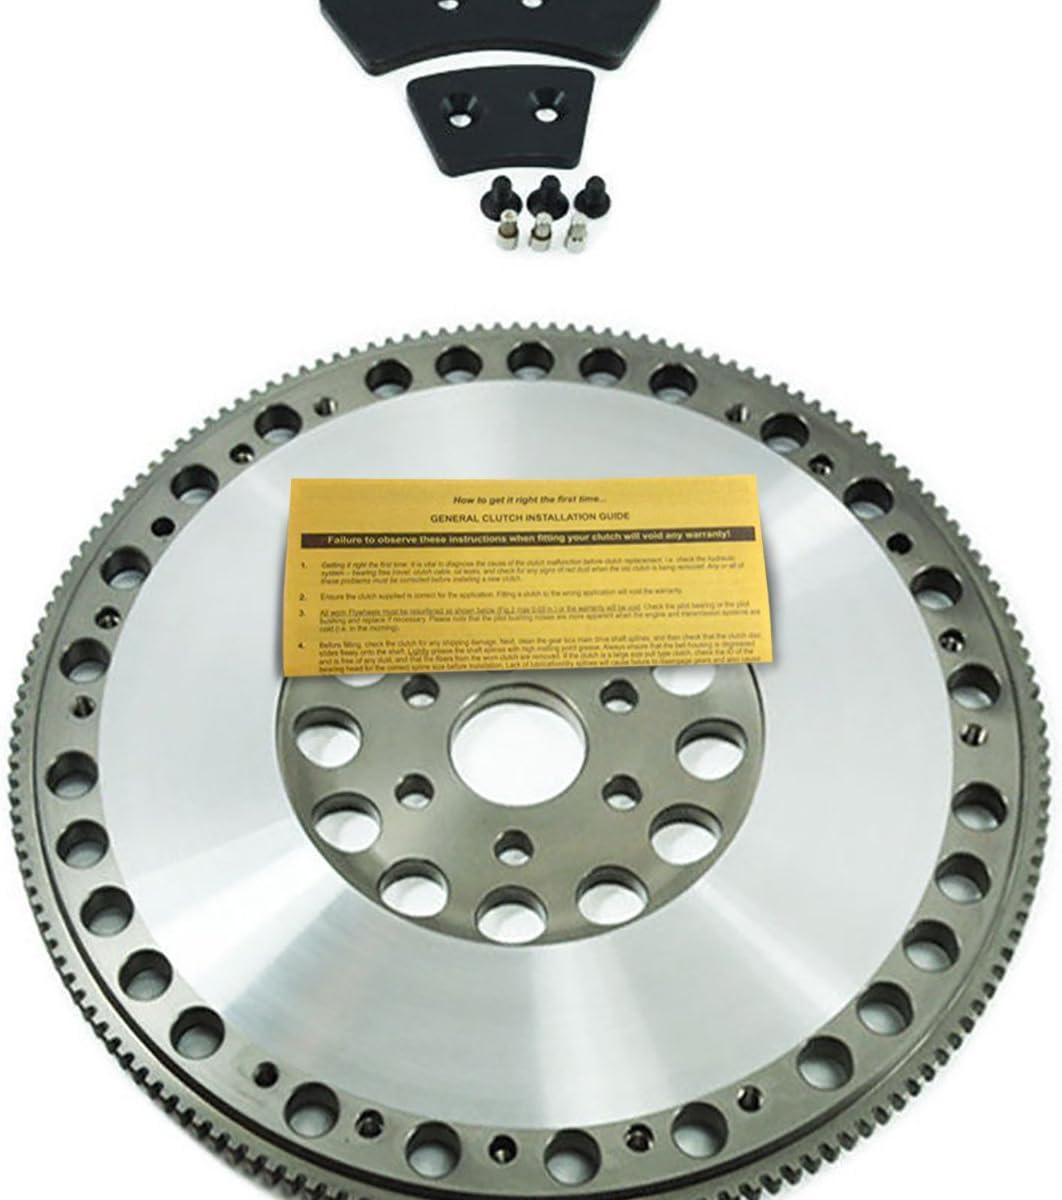 EFT LIGHTWEIGHT CHROMOLY CLUTCH FLYWHEEL FOR 86-95 FORD MUSTANG GT COBRA SVT 5.0L V8